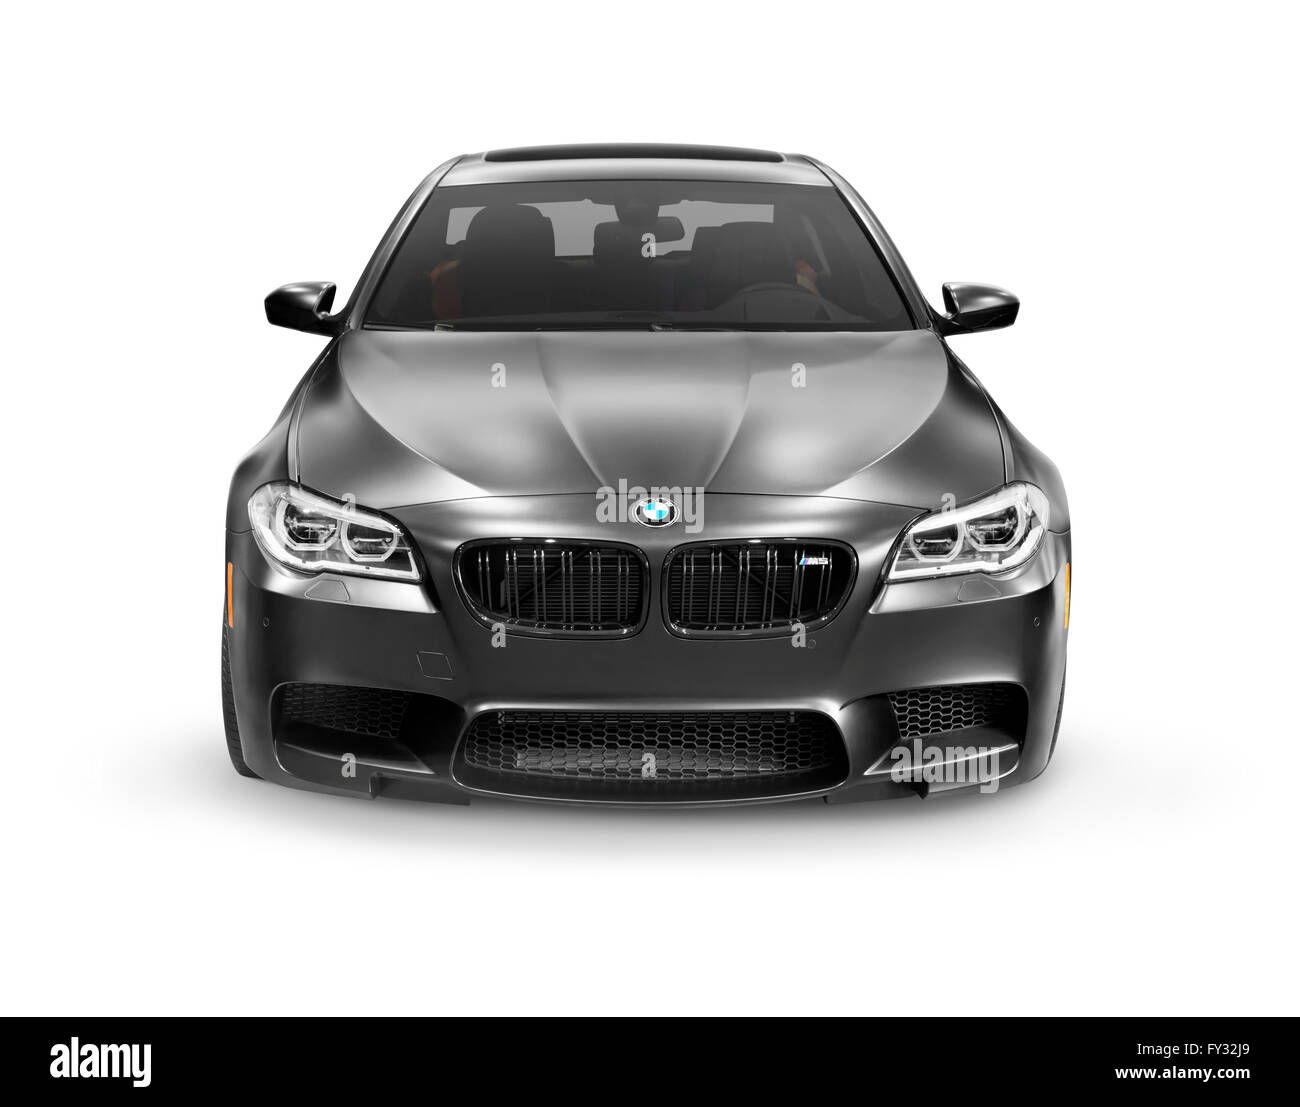 Matte Black 2015 Bmw F10 M5 Luxury Car Stock Photo 102715489 Alamy